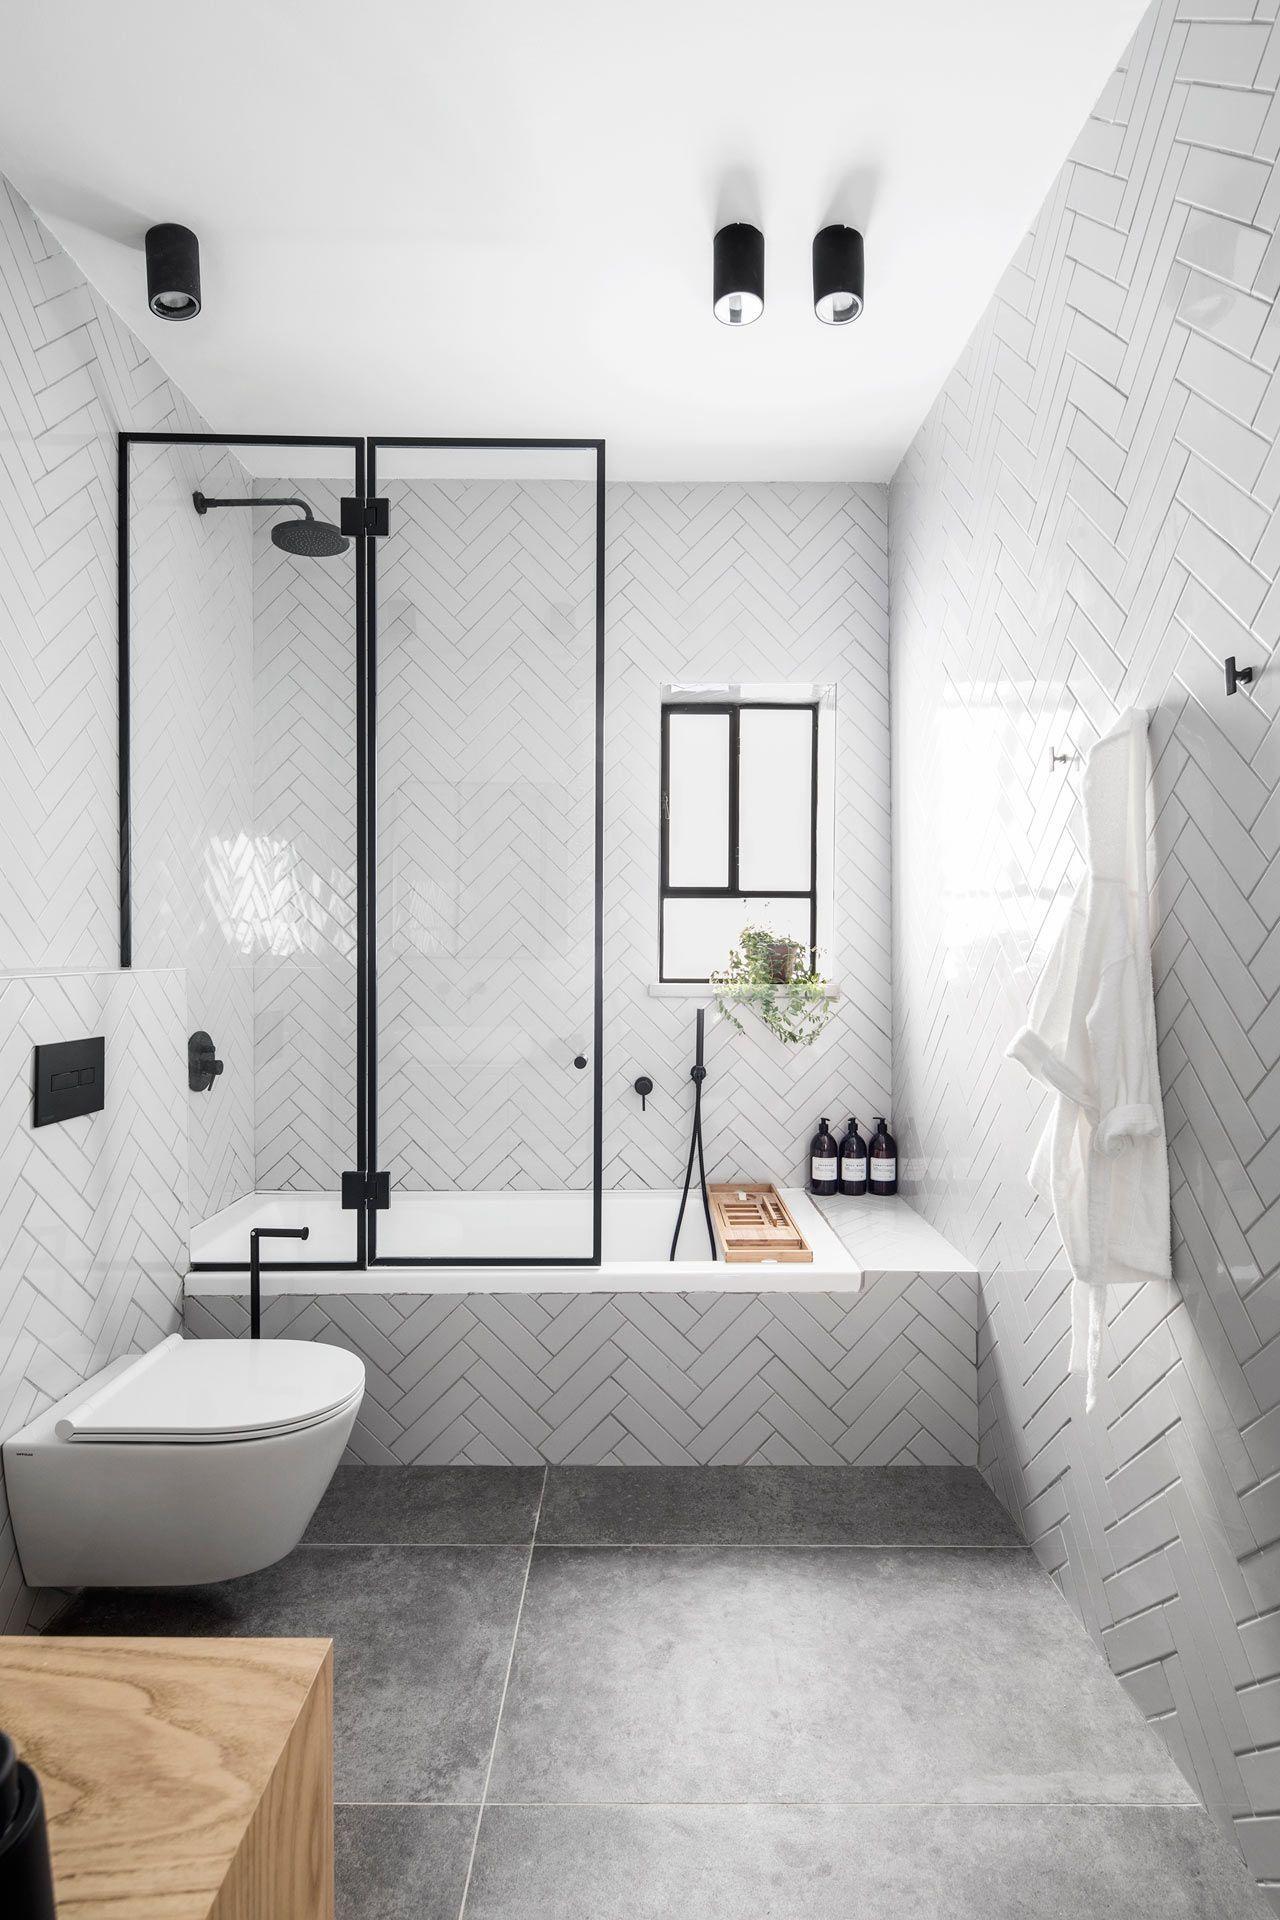 36 Best Ideas Monochromatic Color Scheme For Bathroom Bathroom Interior Design Bathroom Interior Modern Bathroom Design